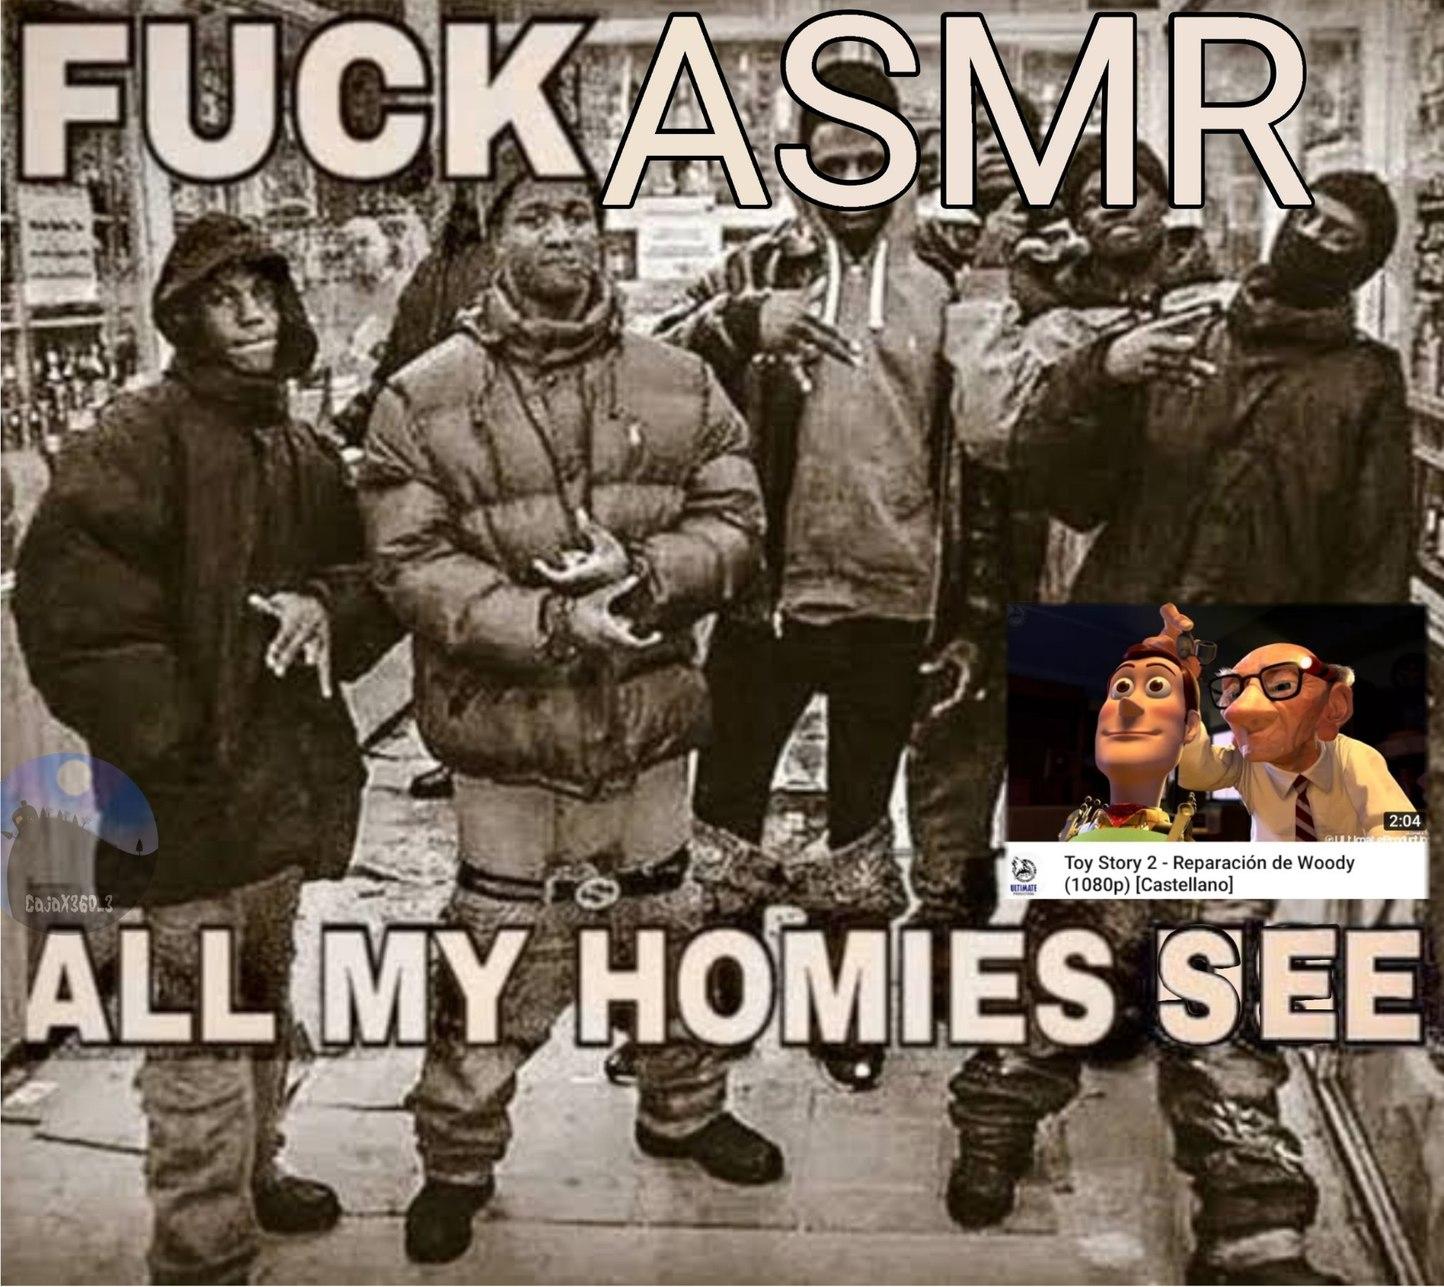 Abecedario - meme